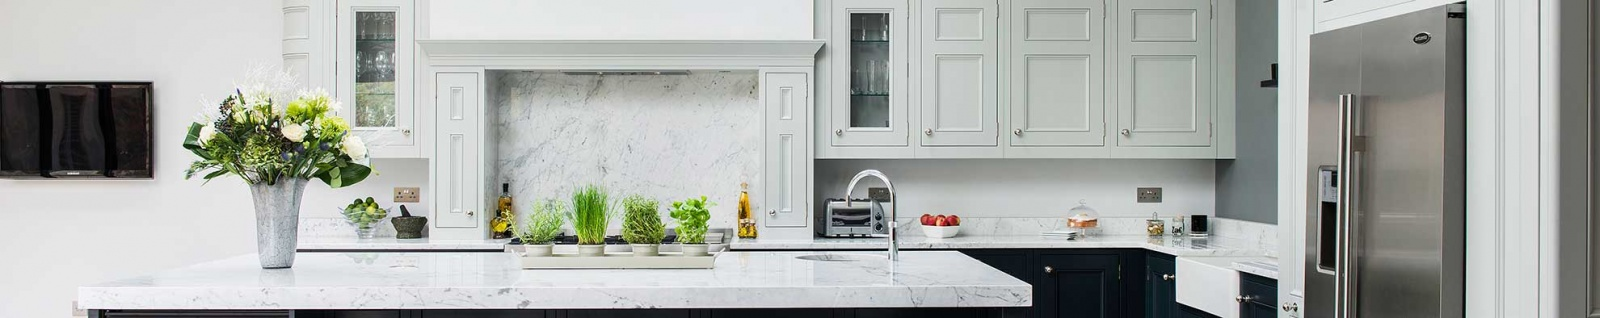 kitchen-extension-ideas